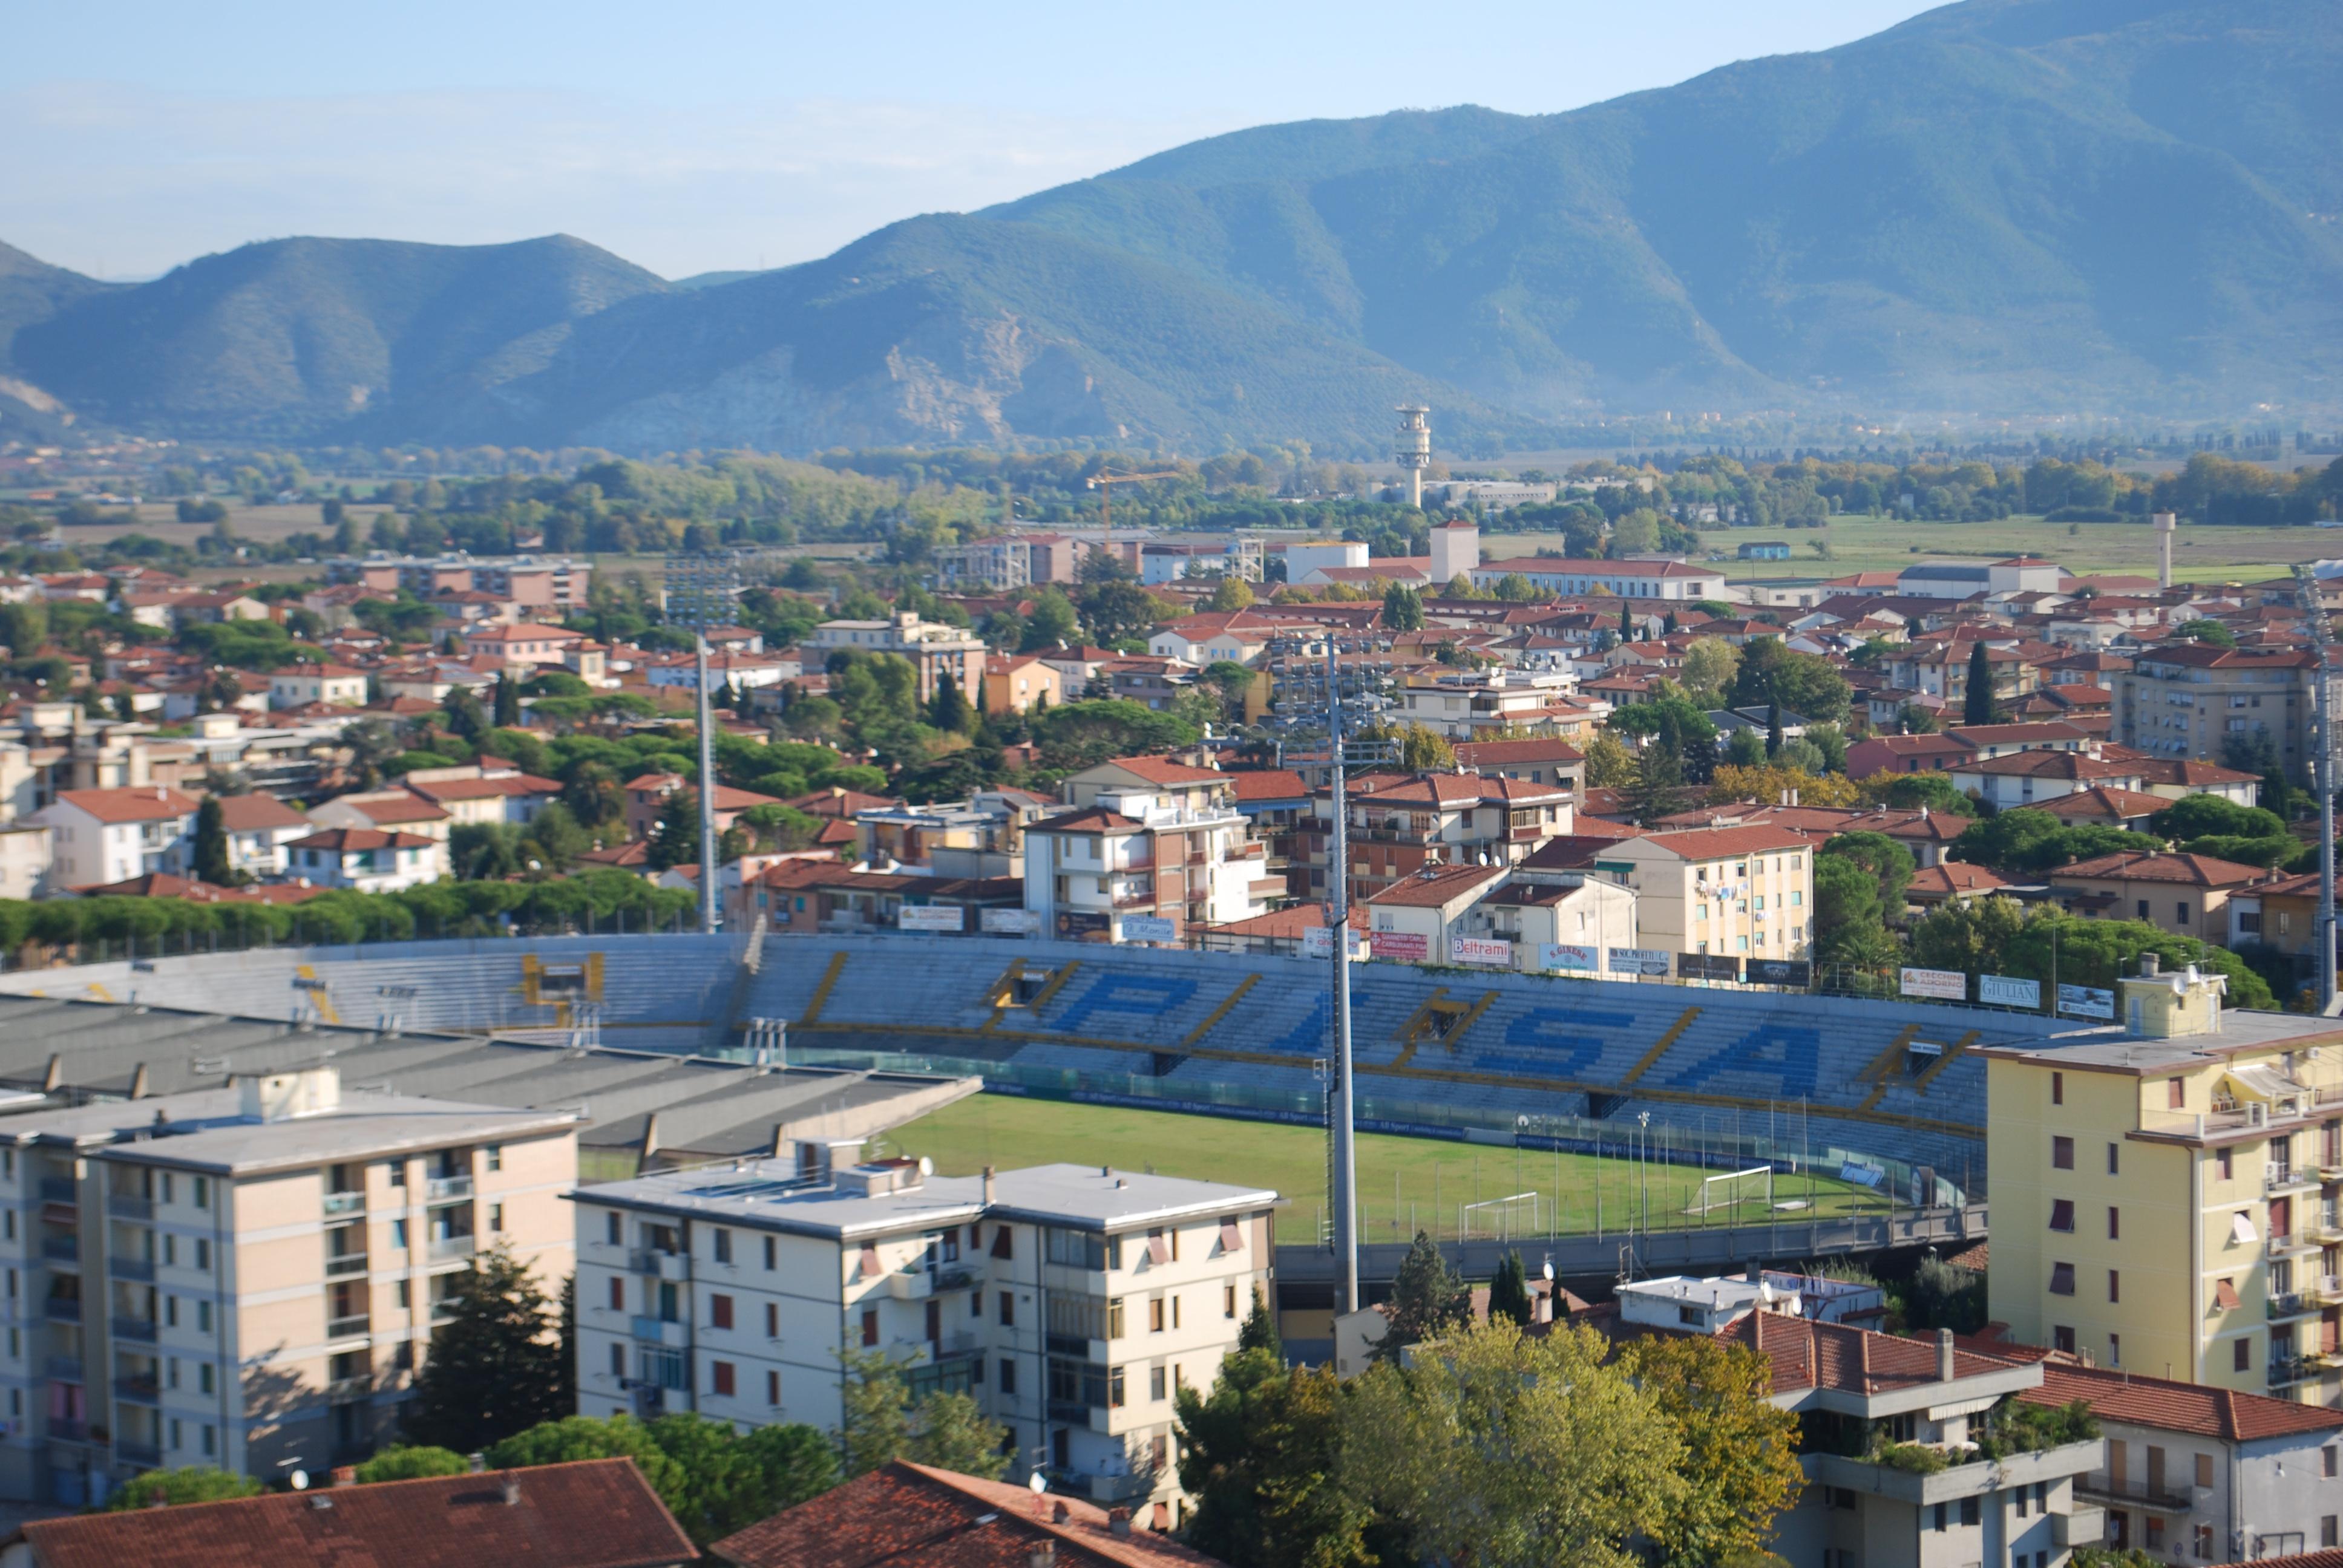 Arena_Garibaldi_–_Stadio_Romeo_Anconetani_A.C._Pisa